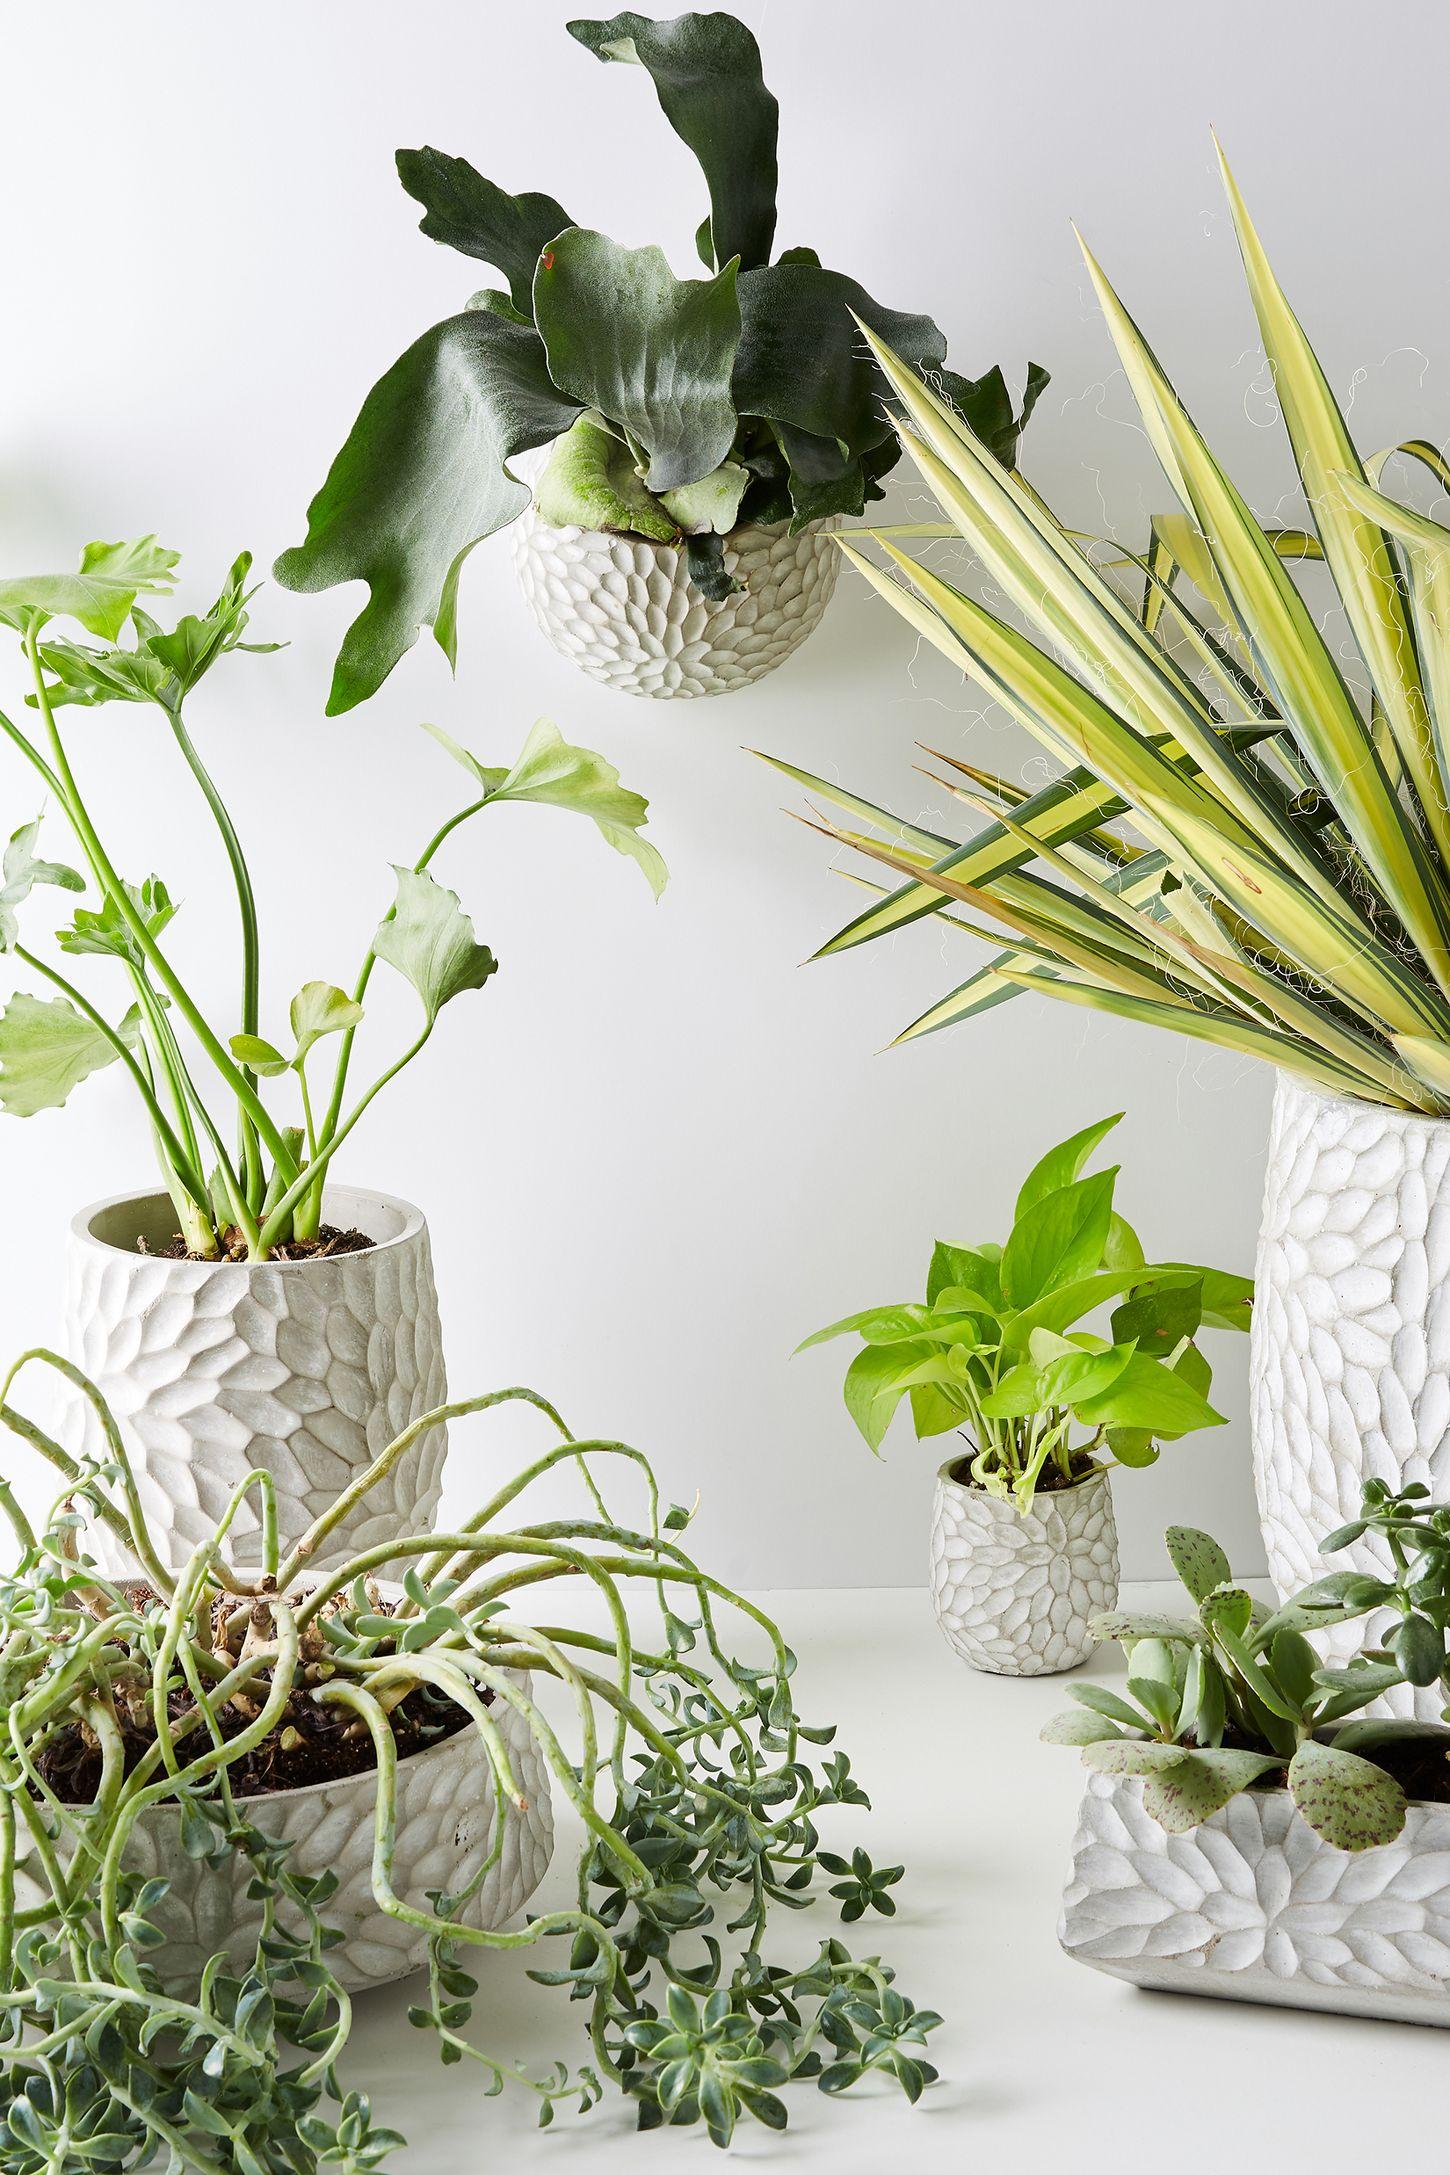 Outdoor Hanging Planter Size hanging planter outdoor furniture garden accessories chrysanthemum pot workwithnaturefo